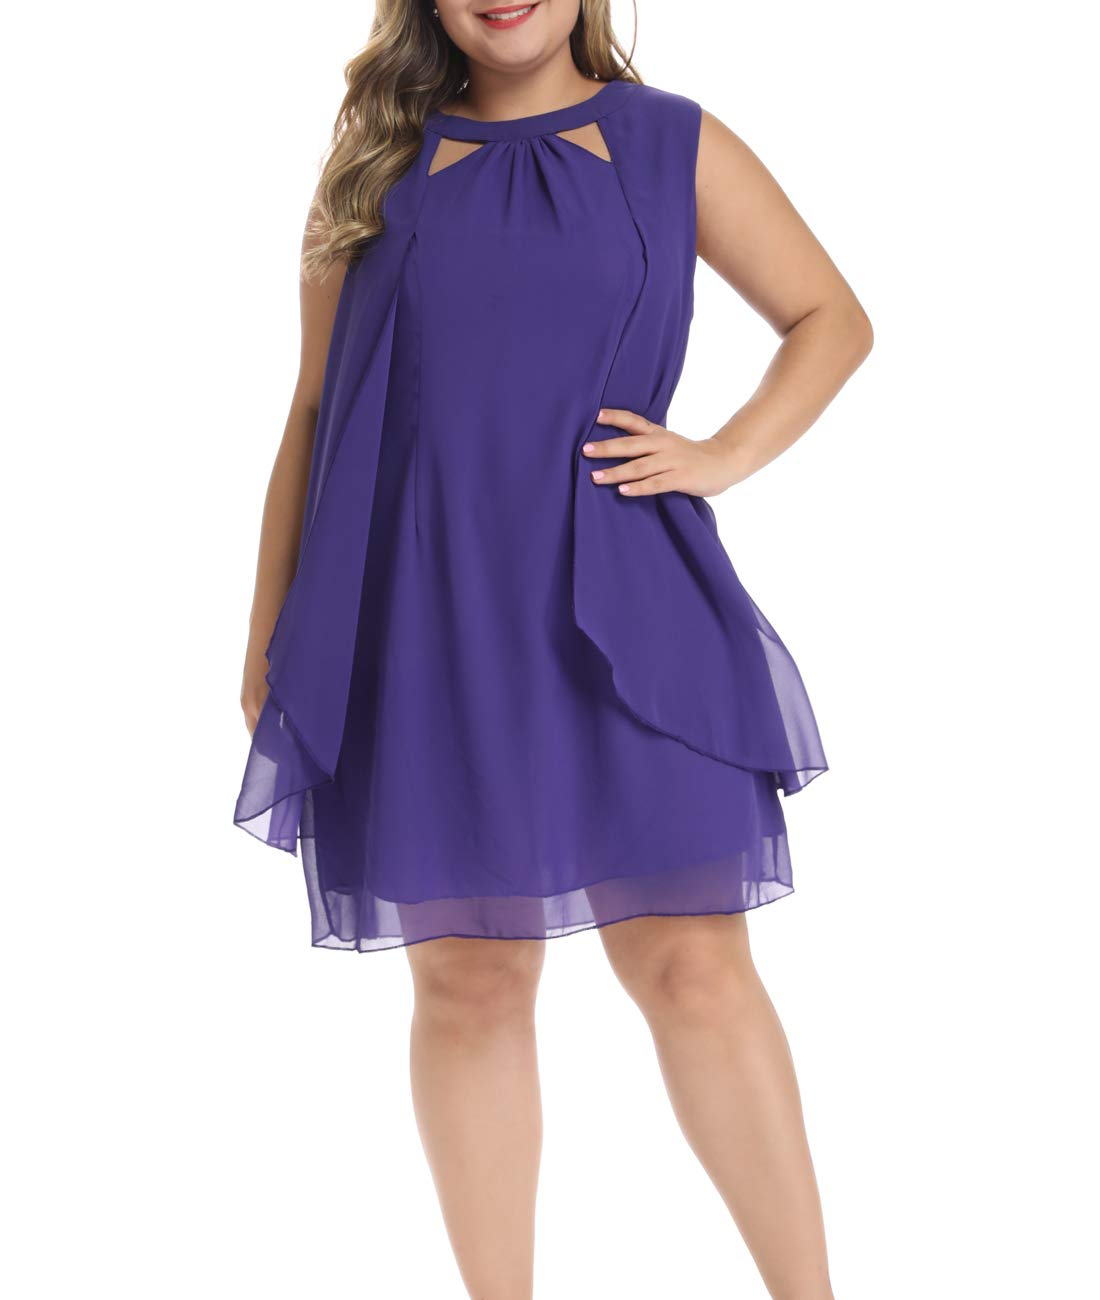 Lalagen Womens Summer Chiffon Sleeveless Plus Size Cocktail Party Knee Length Dress Purple XXXL